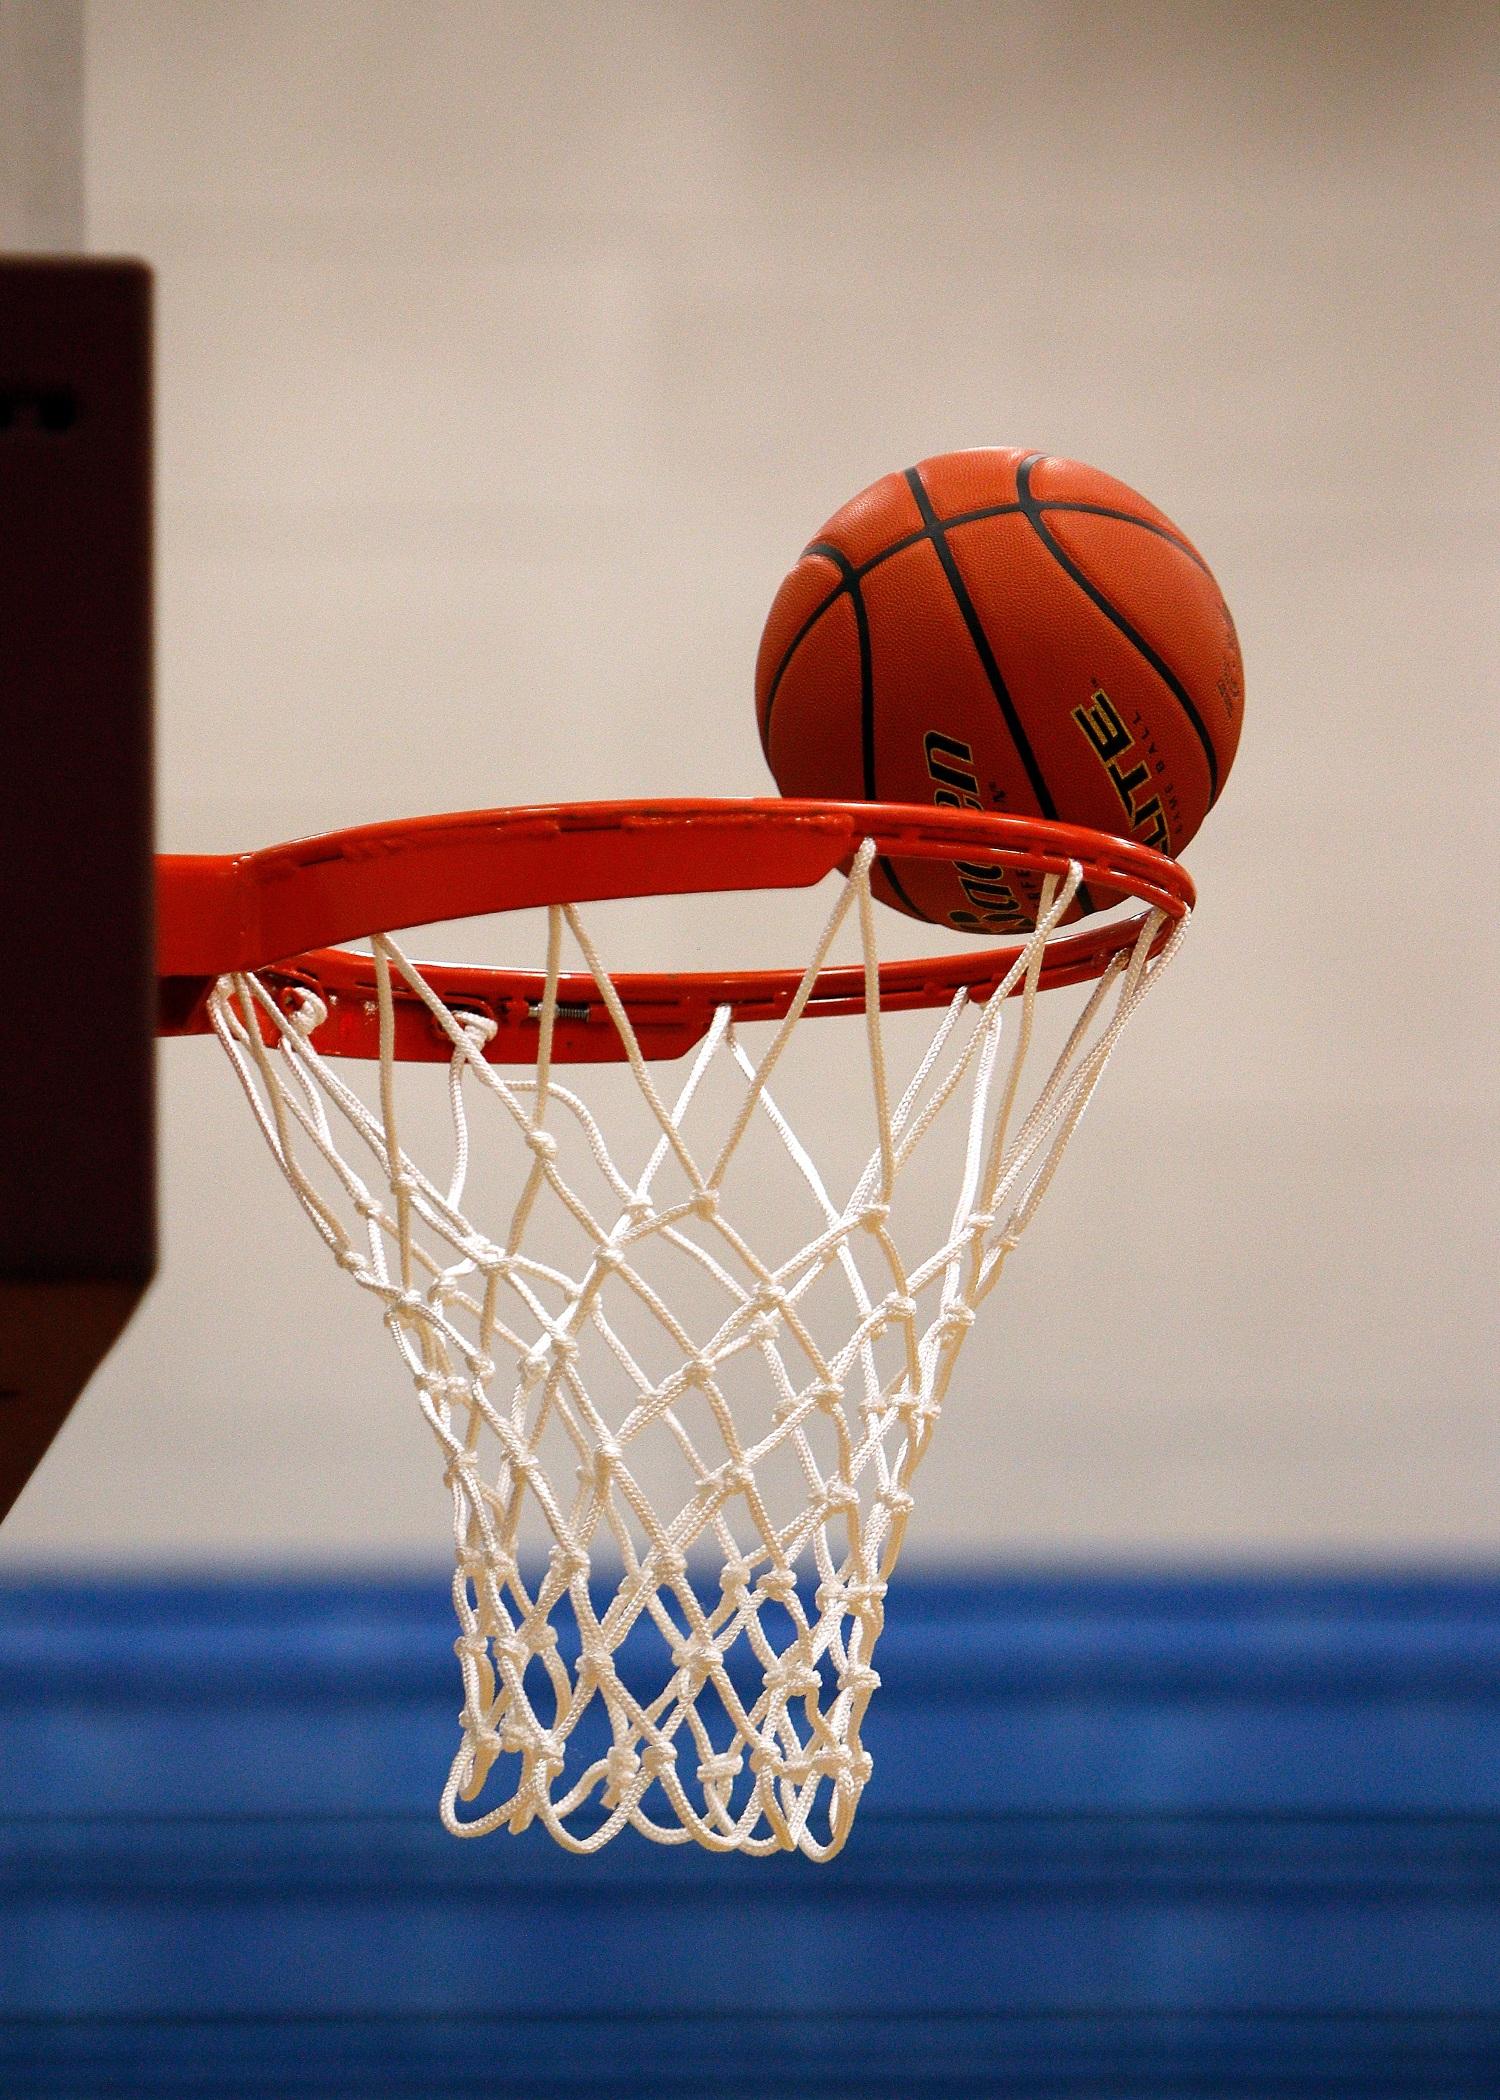 Canva - Basketball, Net, Score, Rim, Hoop, Ball, Goal, Action.jpg